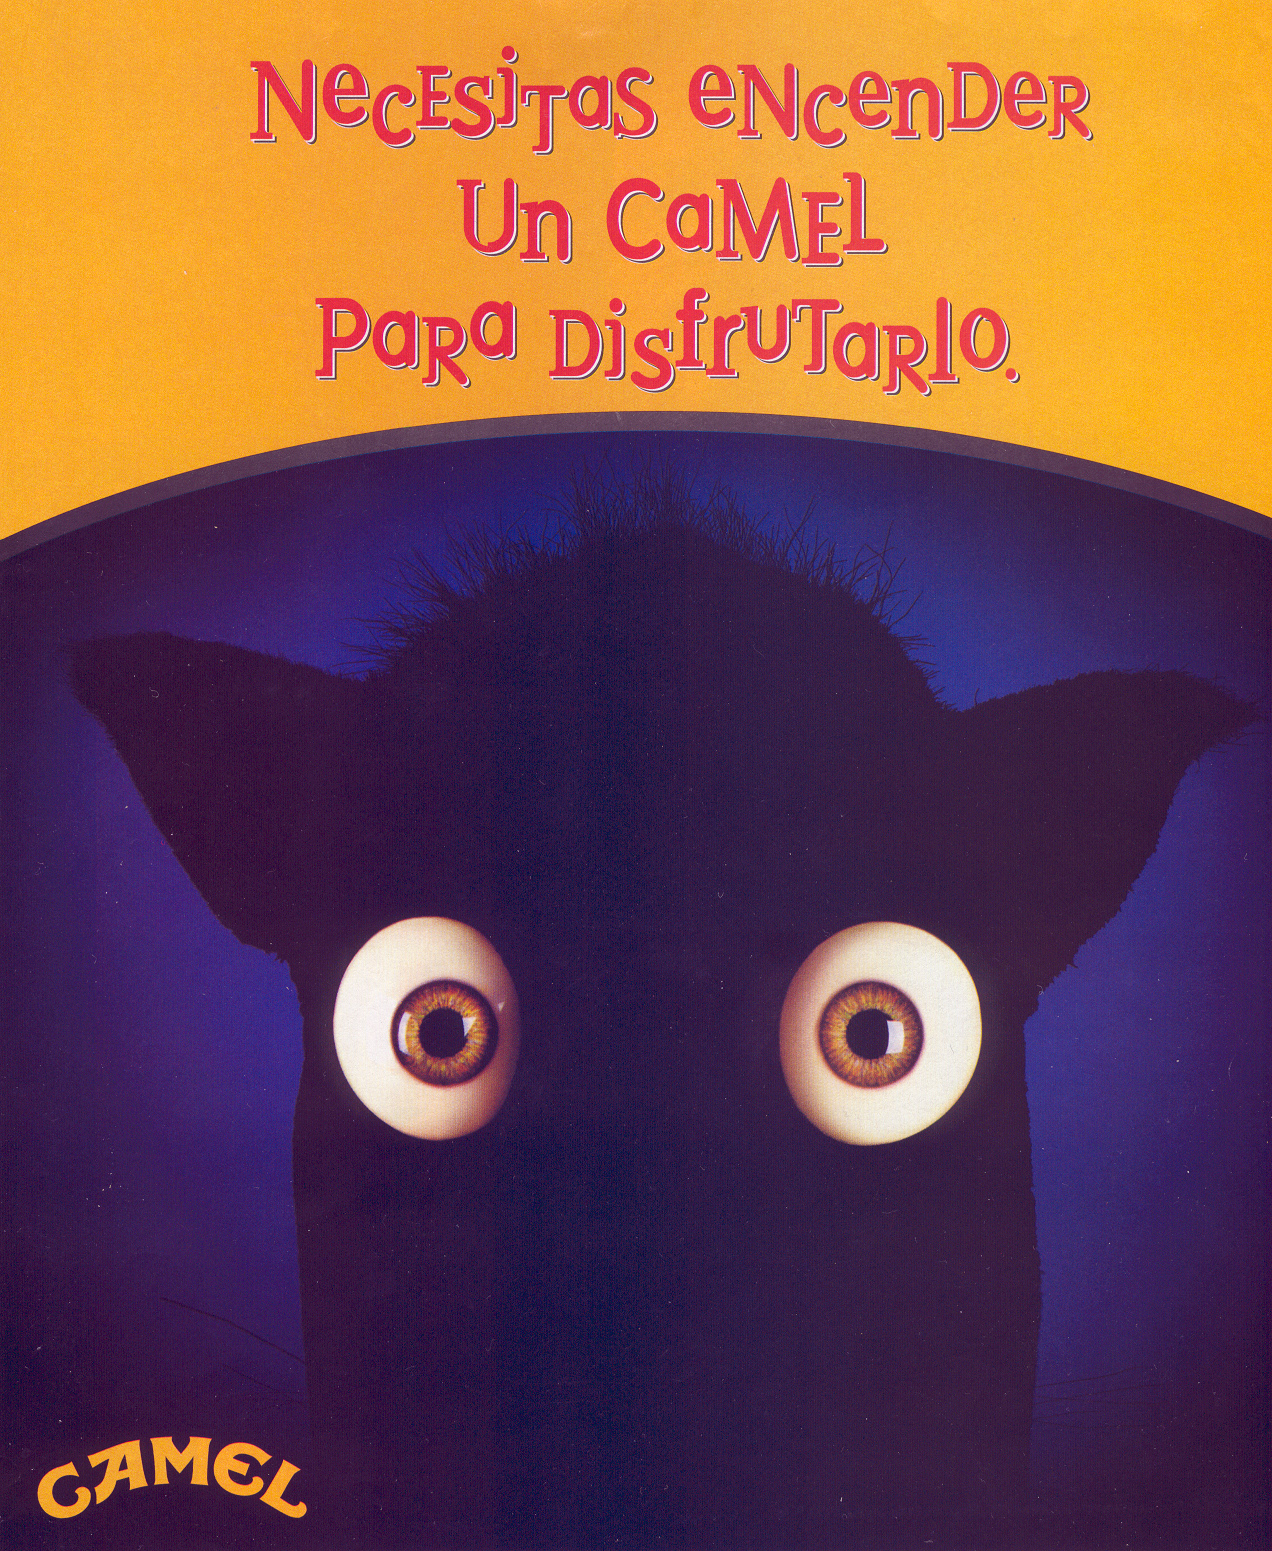 Camel_12